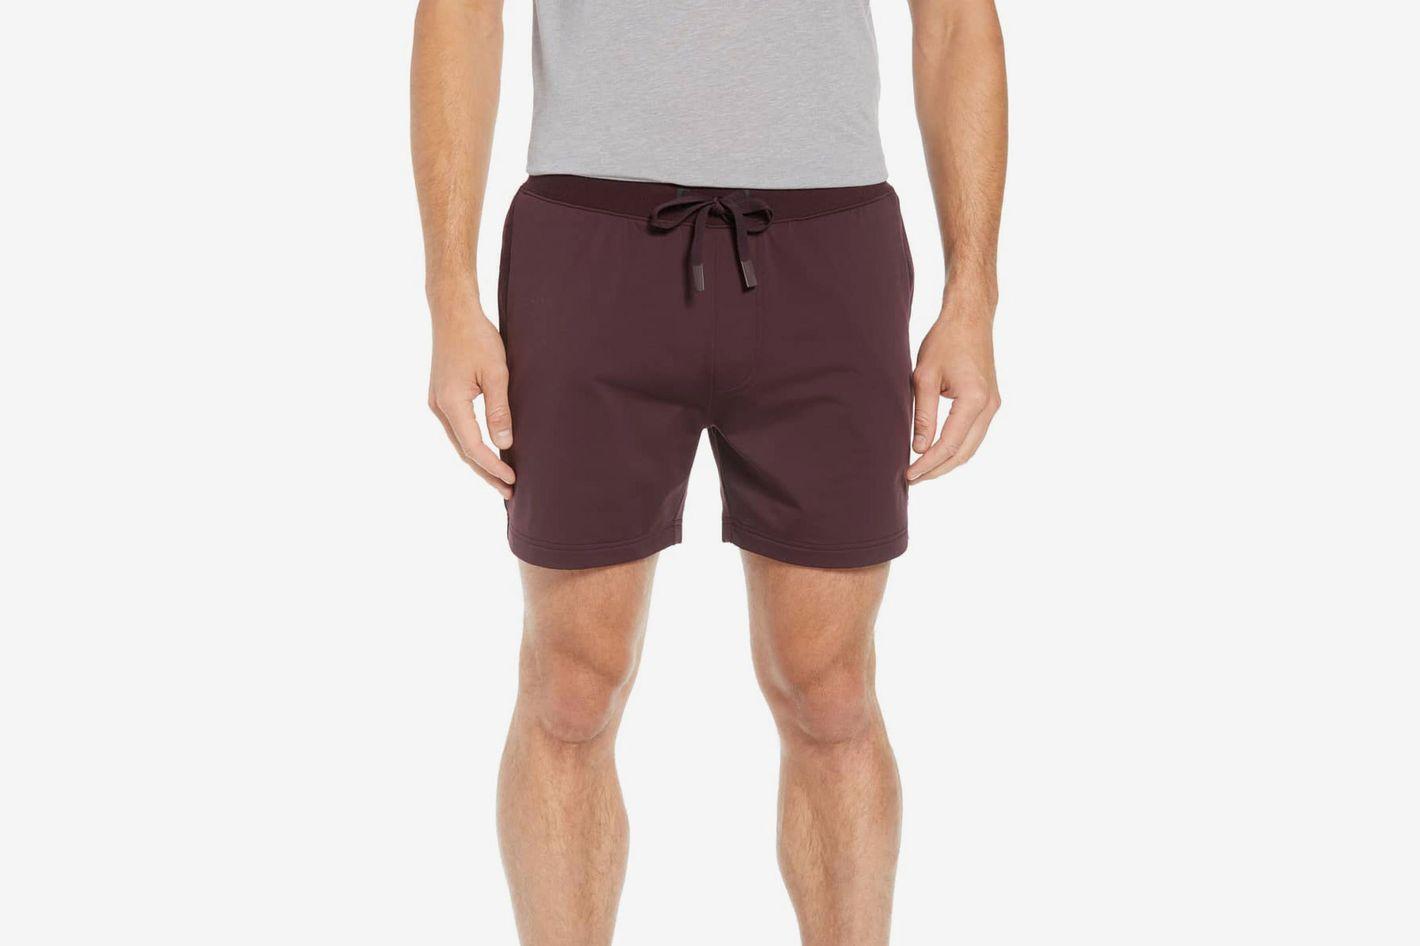 a2e0745a09 The 15 Best Yoga Clothes for Men 2019